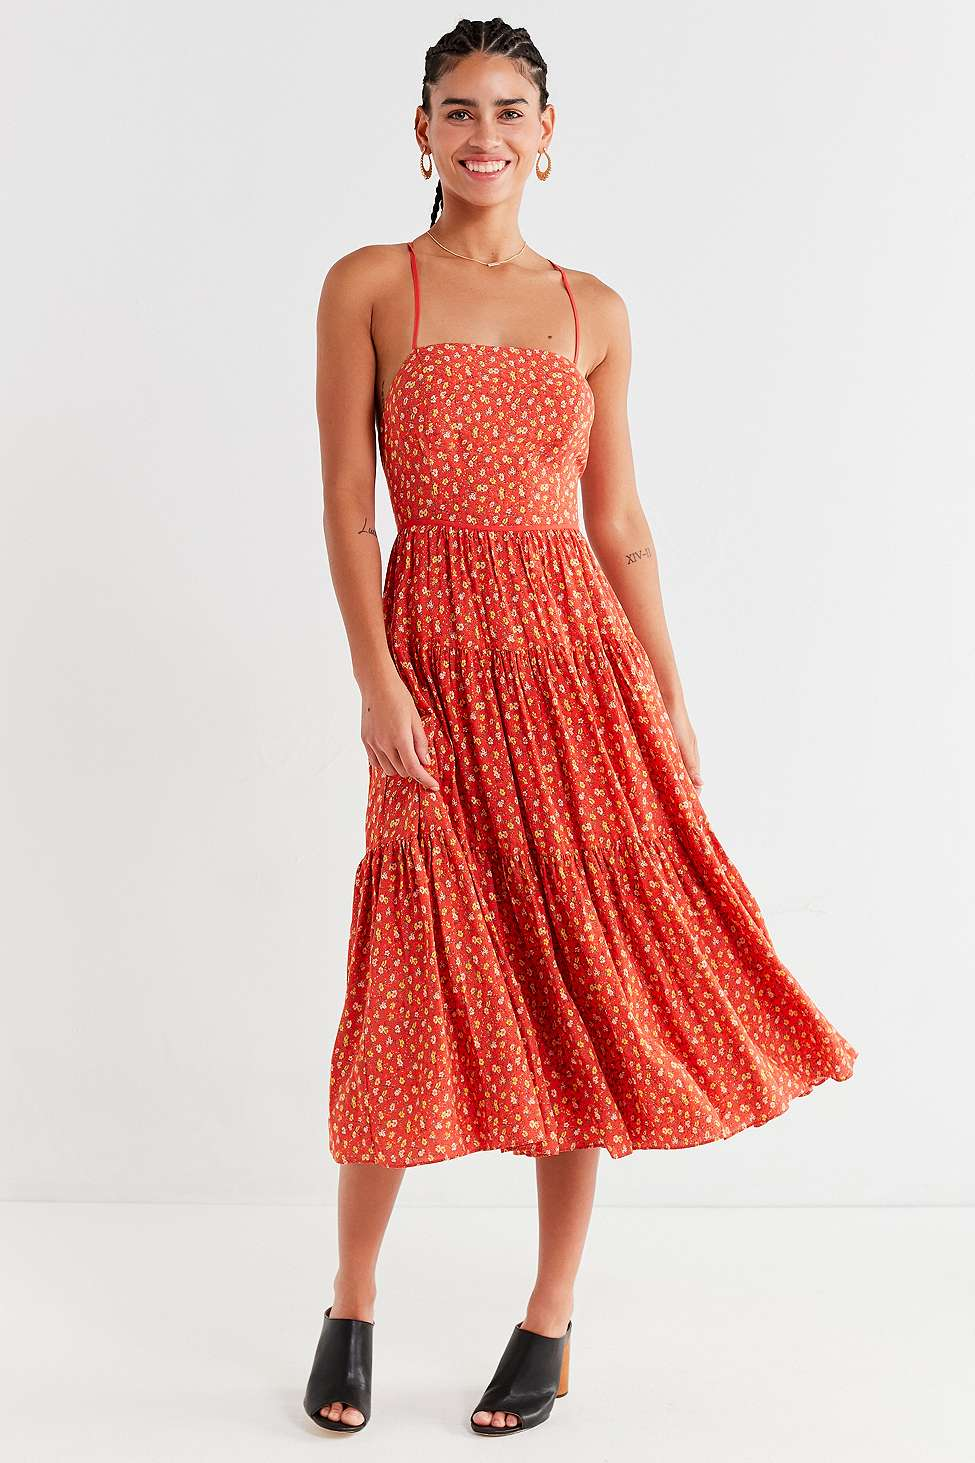 Urban outfitters boho orange dress